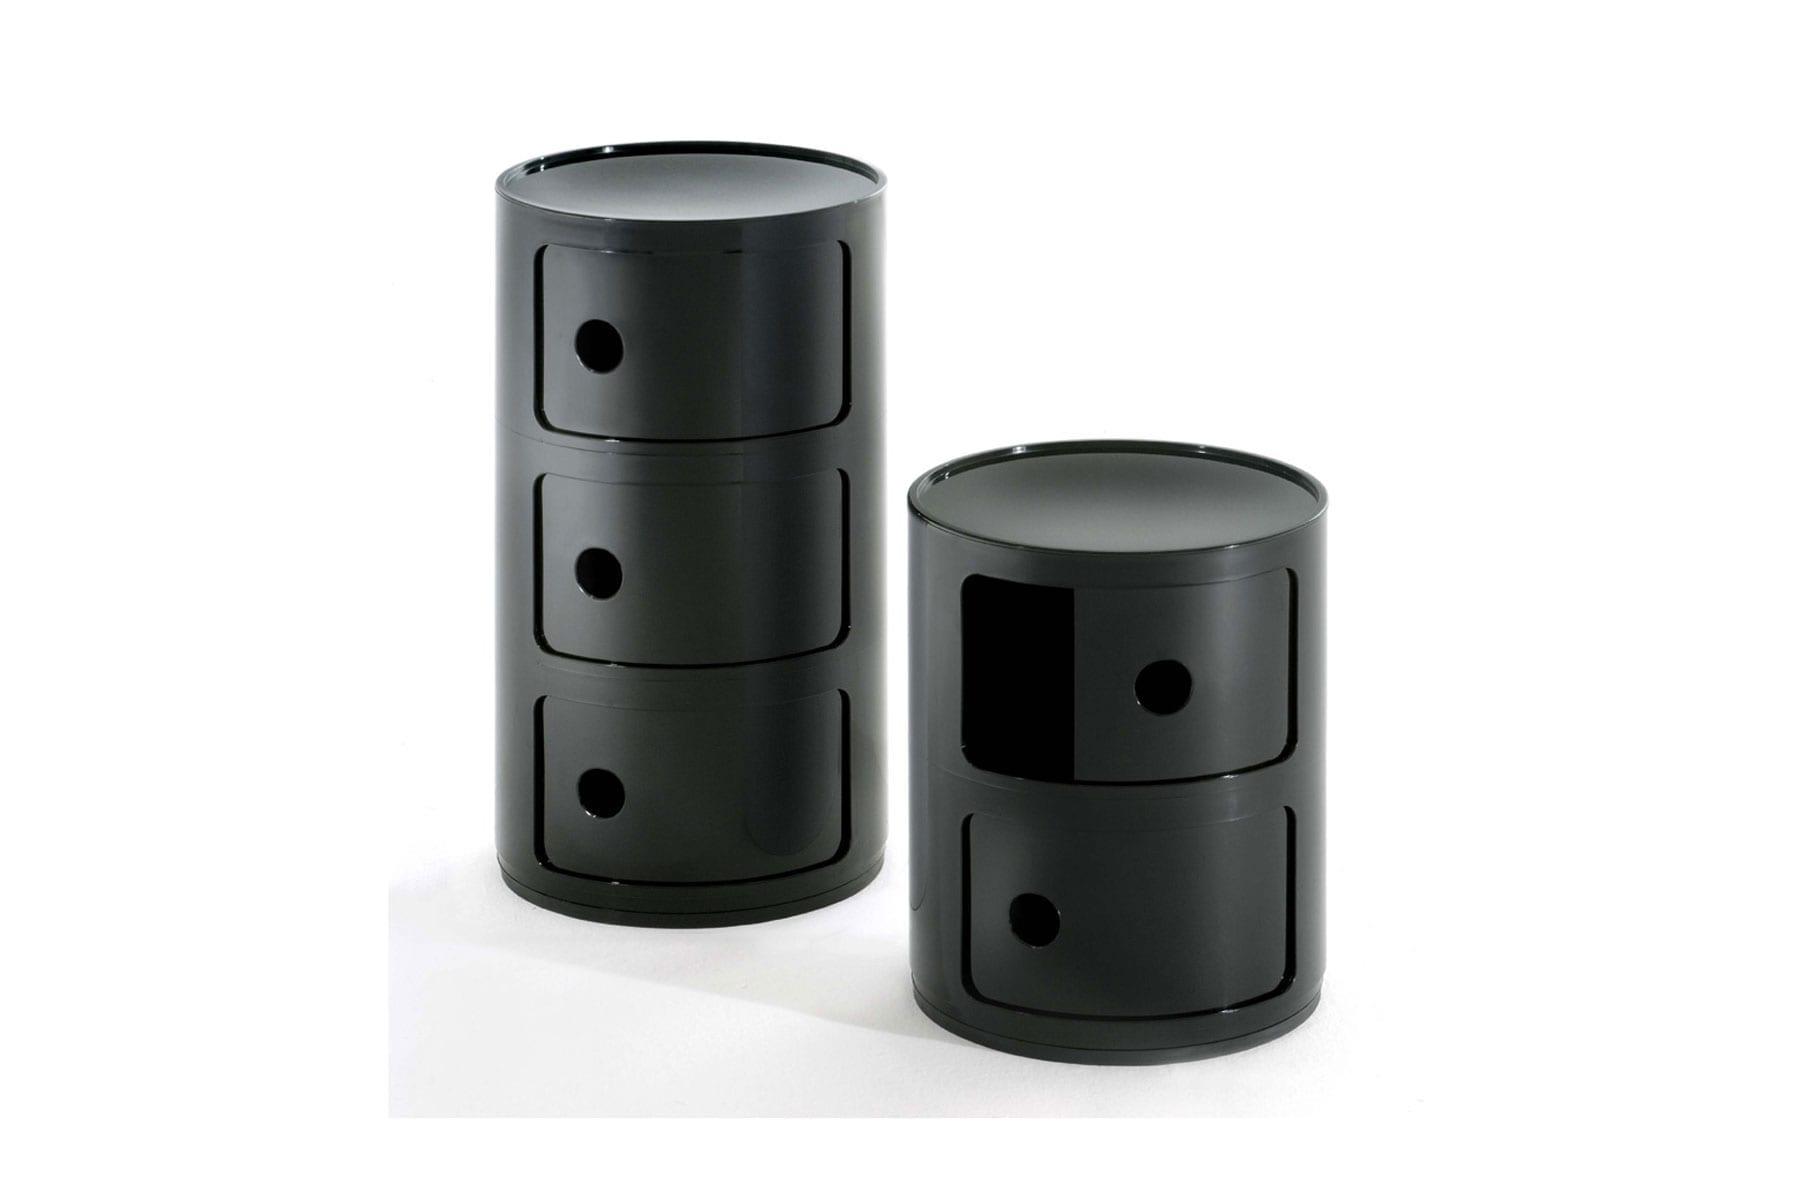 kartell componibili 2 elements mckenzie willis. Black Bedroom Furniture Sets. Home Design Ideas